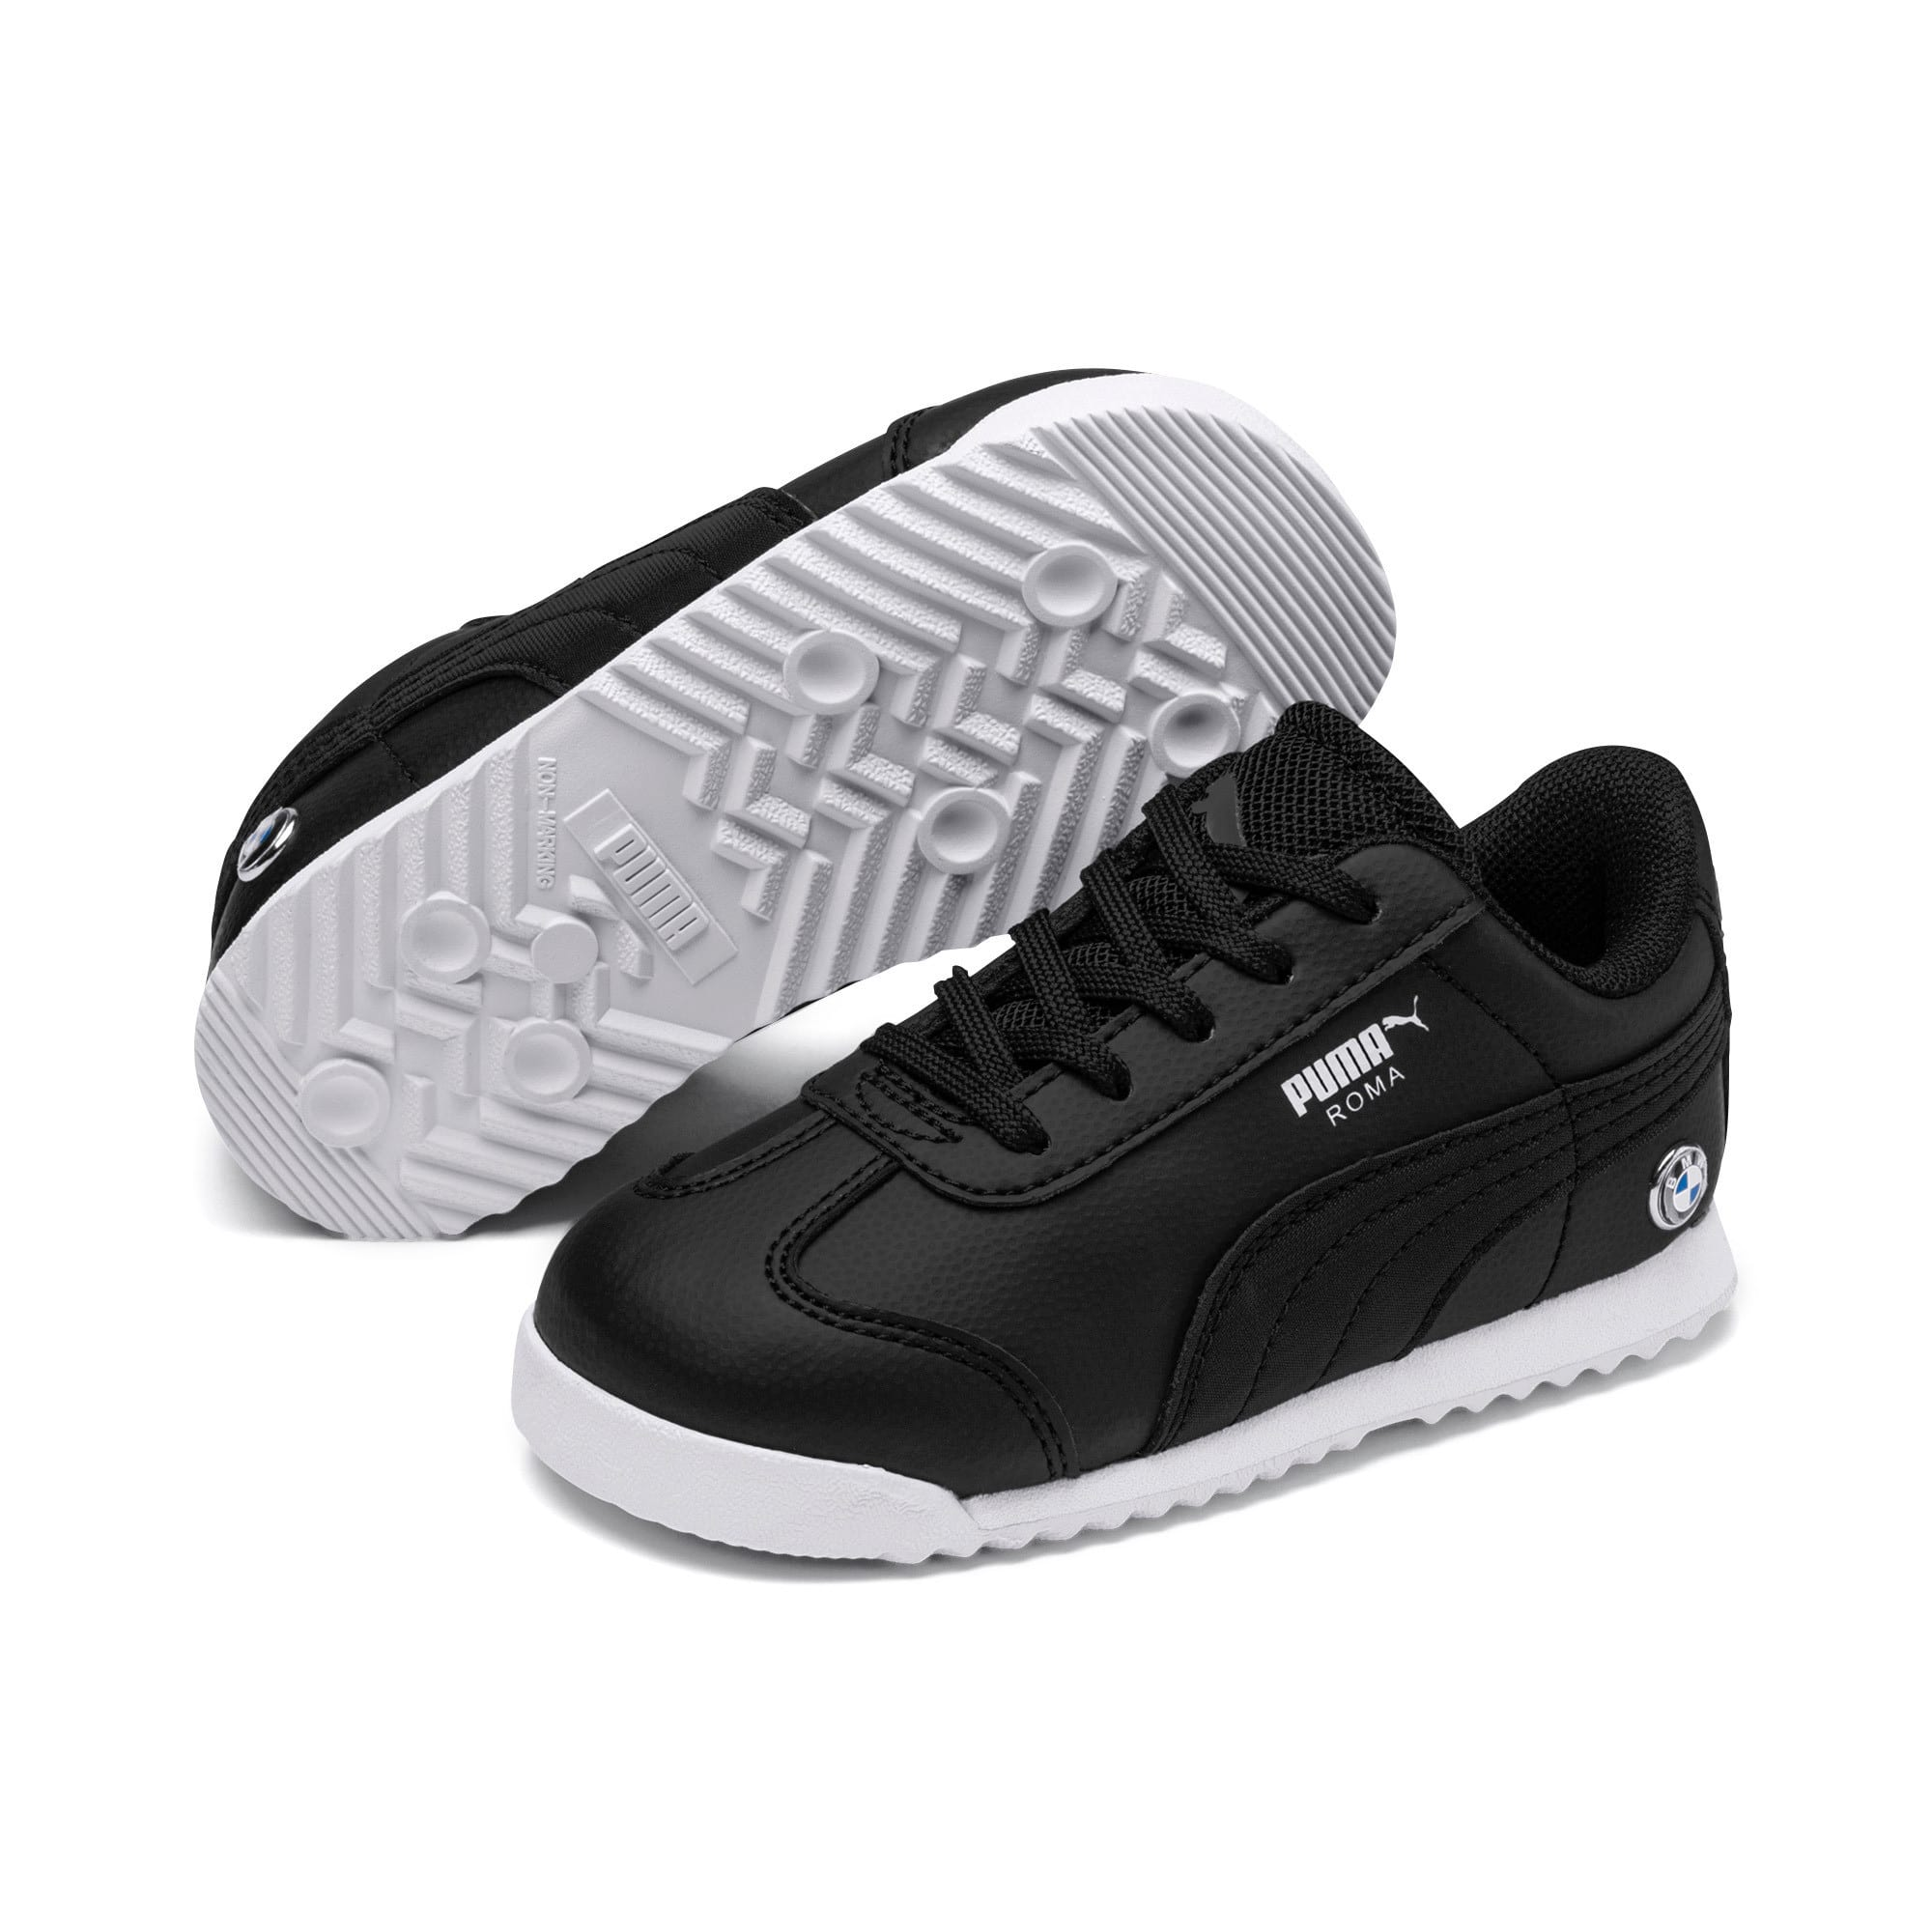 Thumbnail 2 of BMW M Motorsport Roma Toddler Shoes, Puma Black-Puma Black, medium